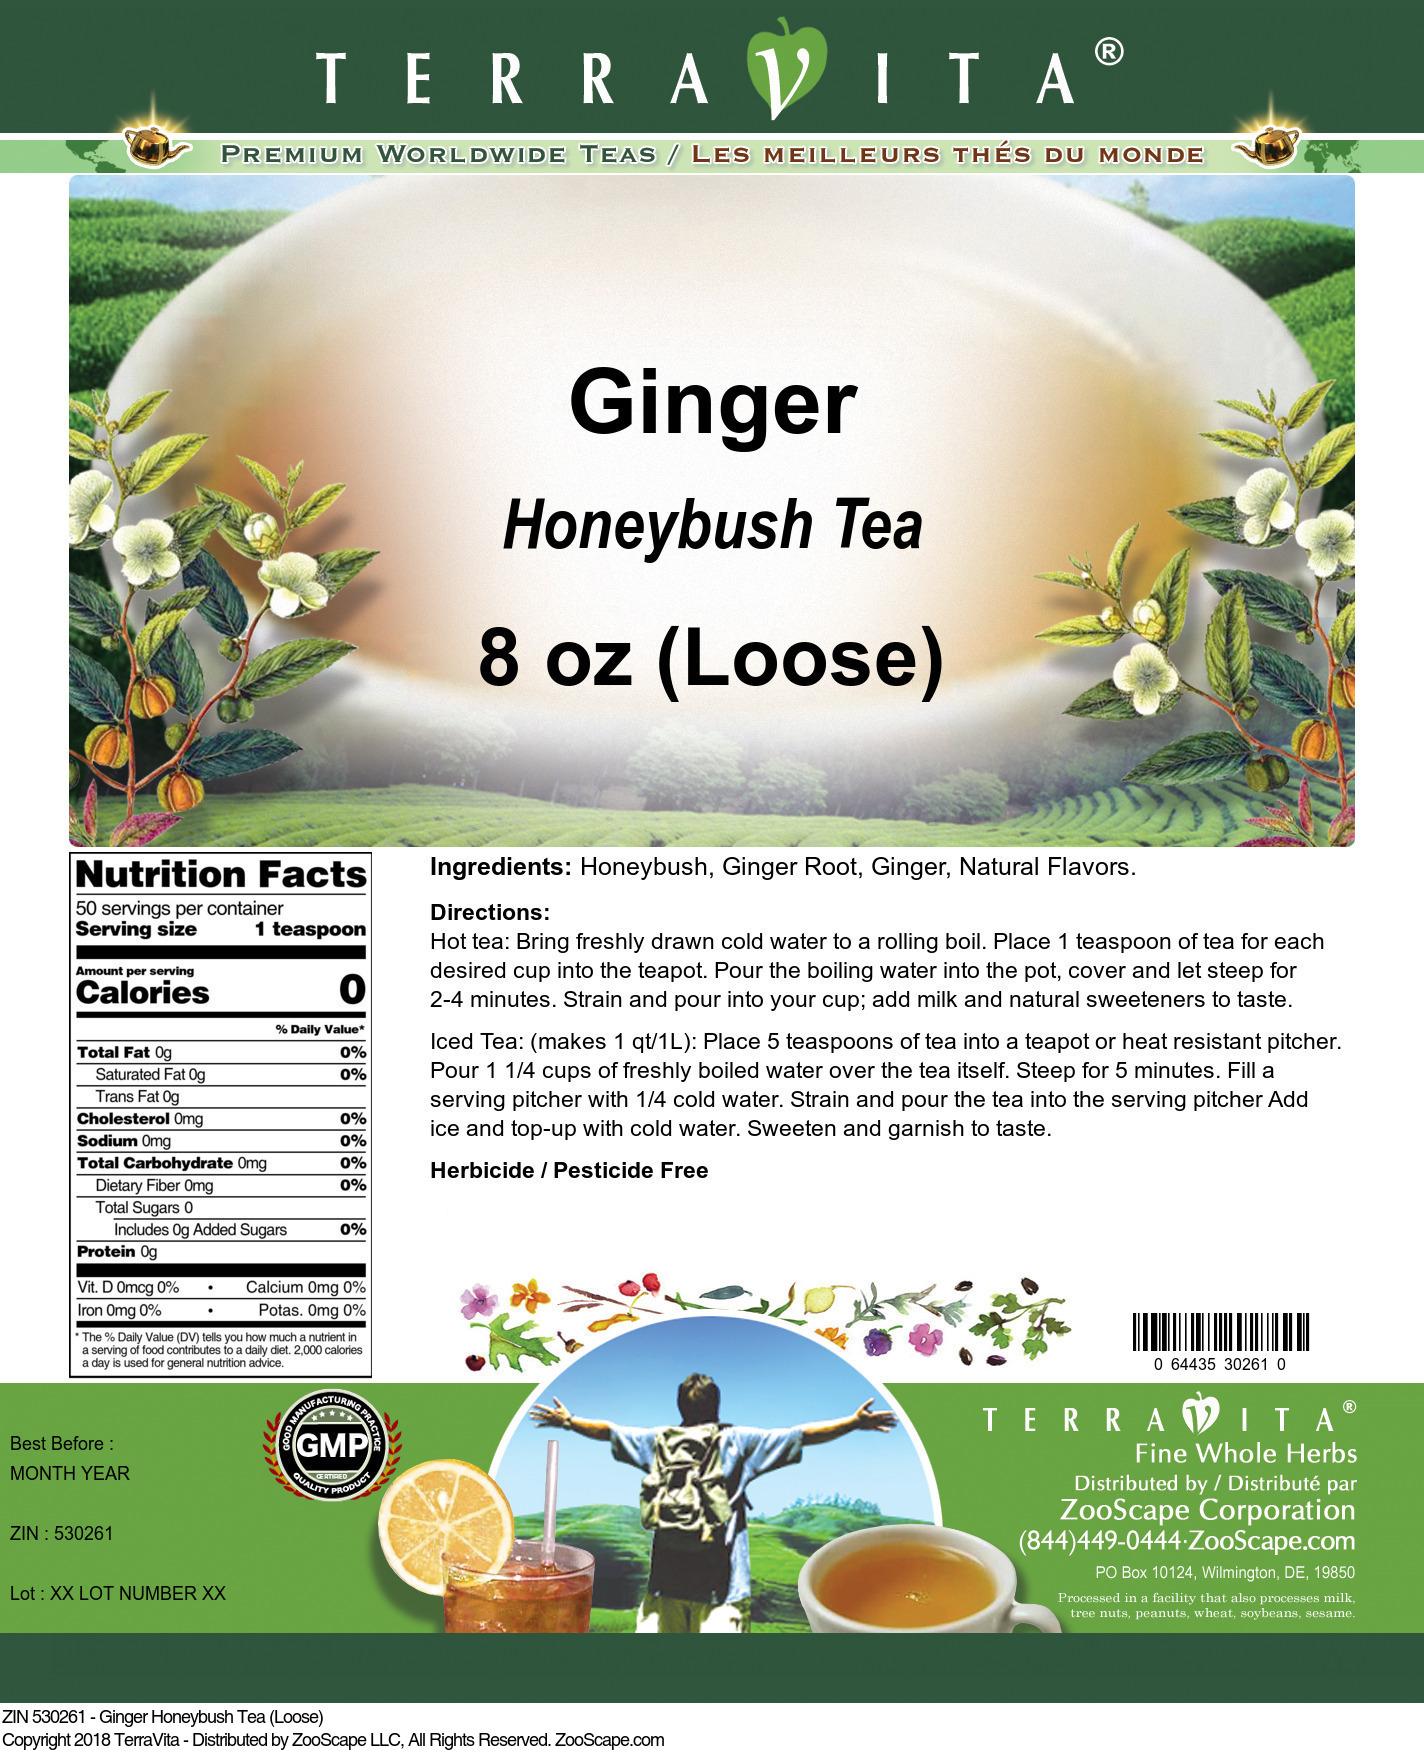 Ginger Honeybush Tea (Loose)